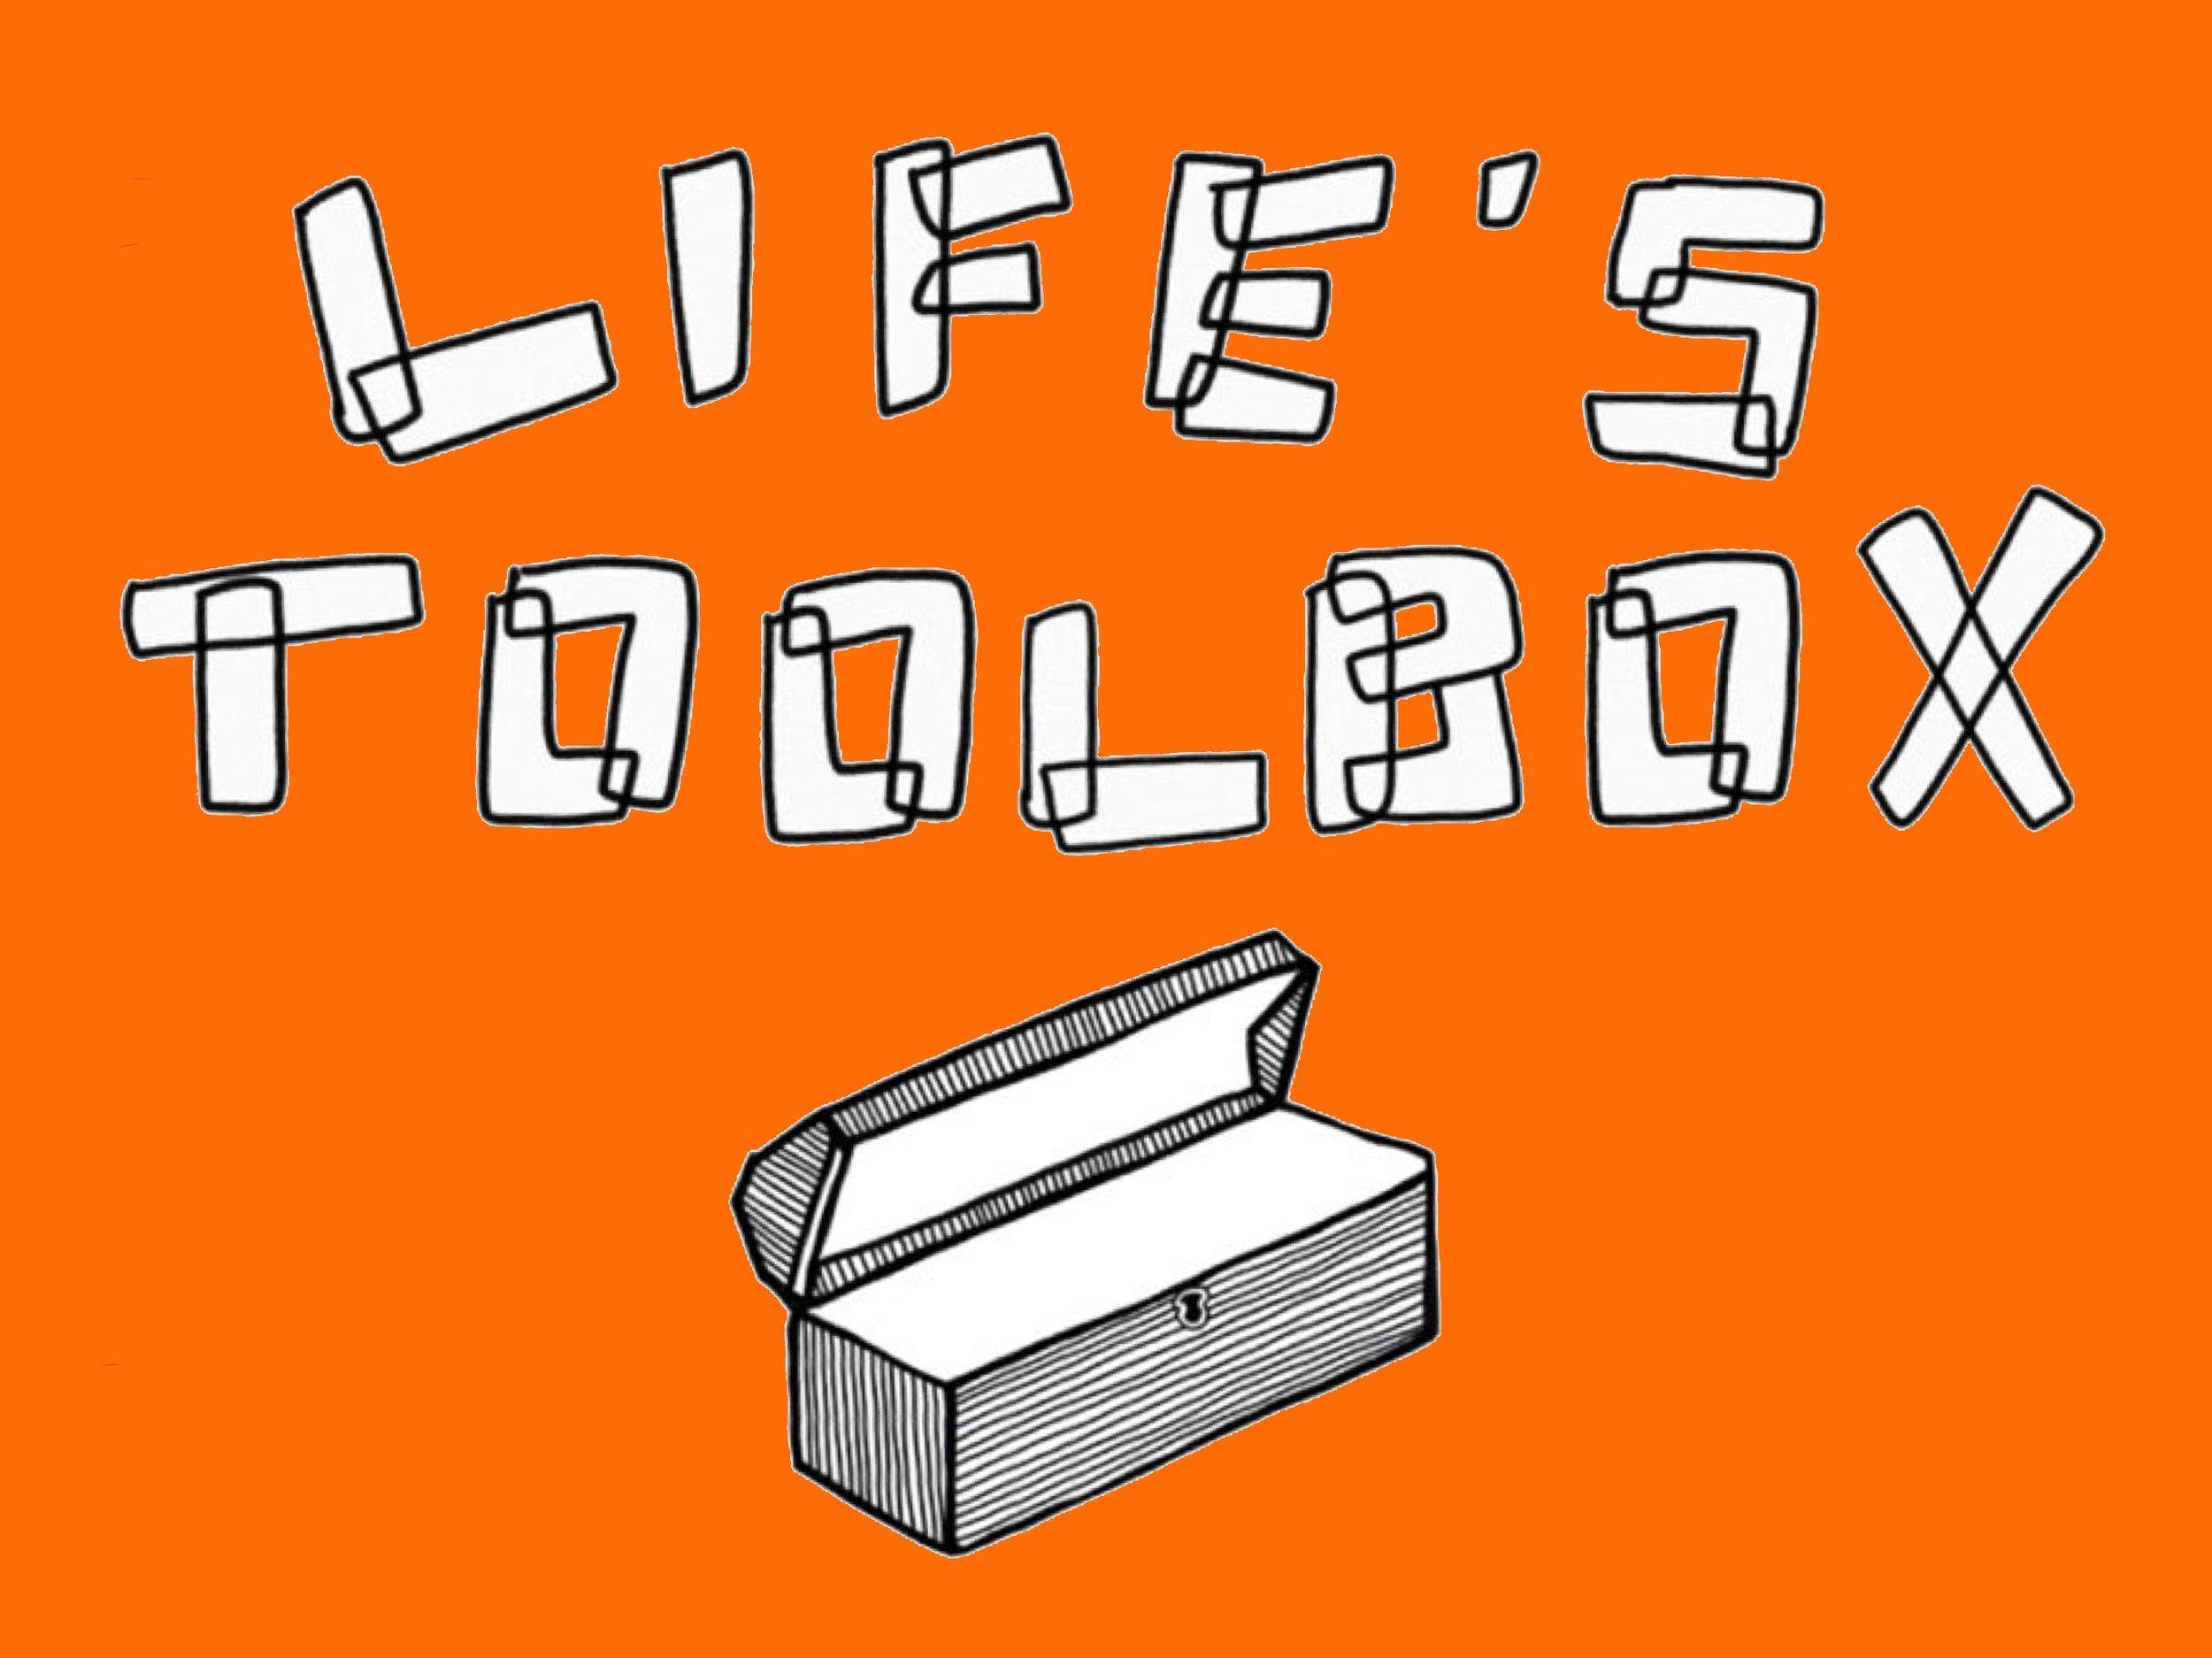 Life's Toolbox - a foundation life skills program to kick start a journey of self-awareness